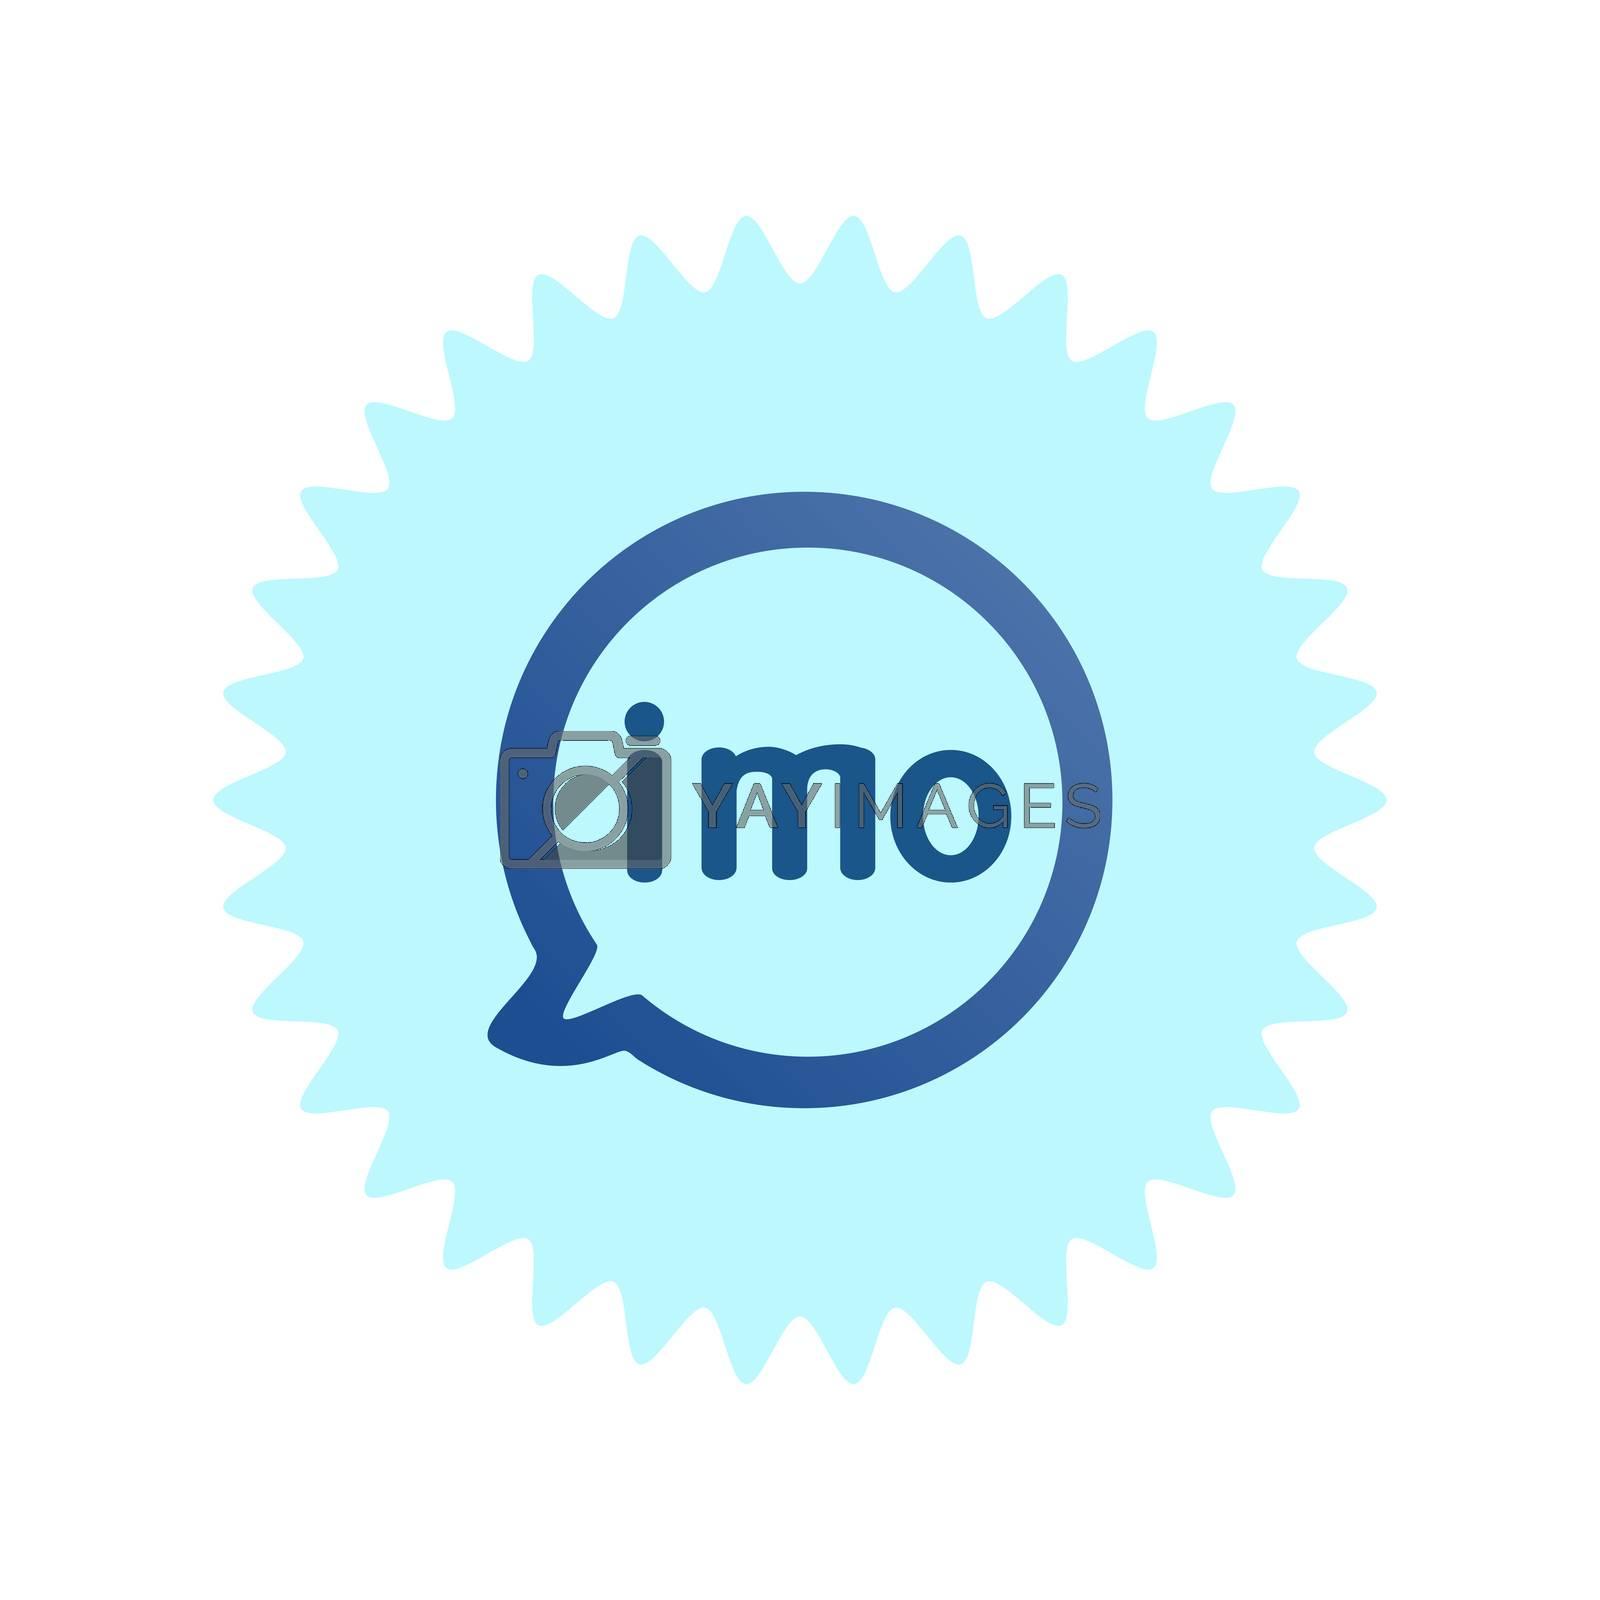 Imo logo. Imo free video calls and chat app logo. Imo video calls and chat app . Kharkiv, Ukraine - June, 2020